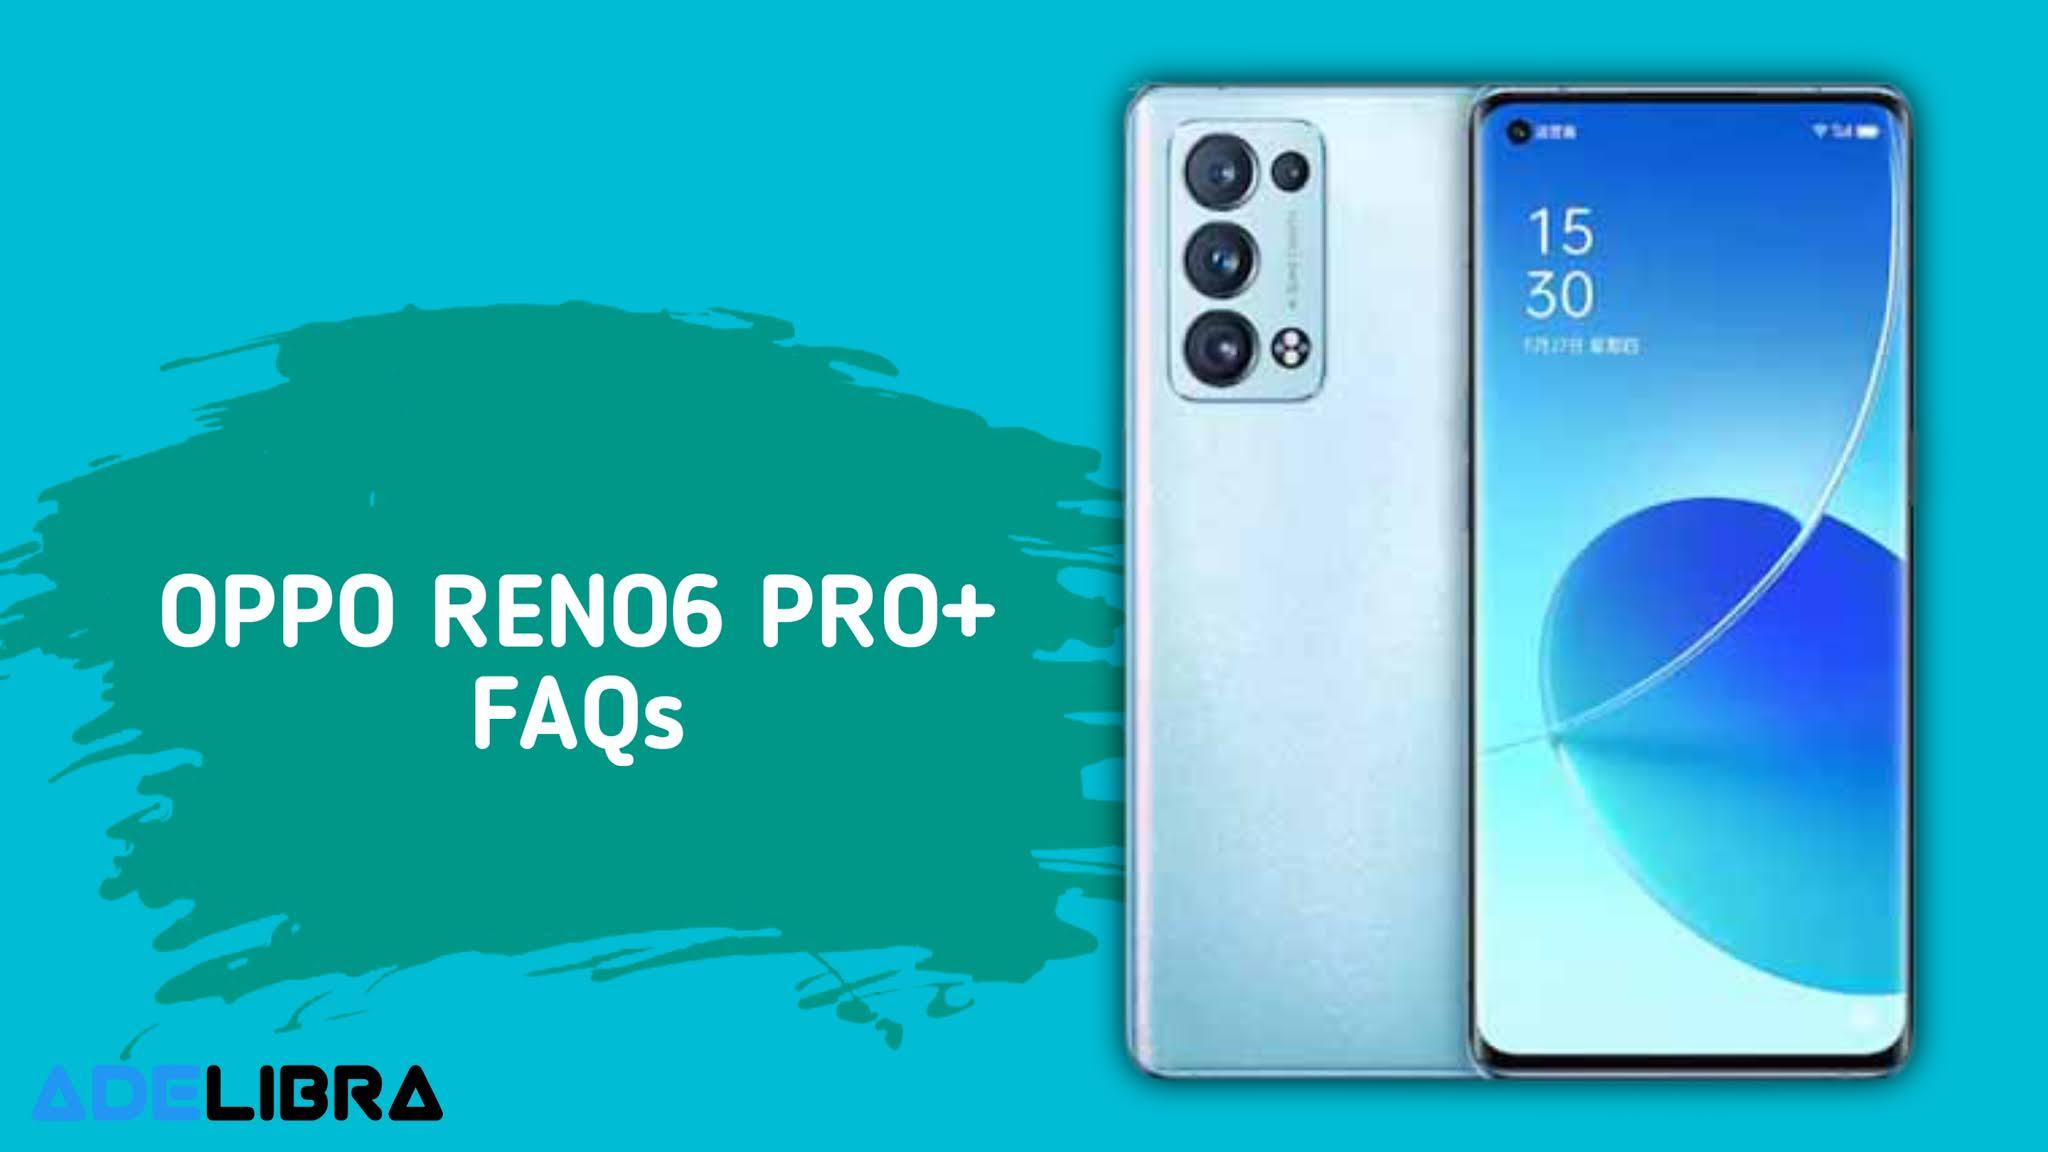 Tanya Jawab Oppo Reno 6 Pro Plus 5G FAQs